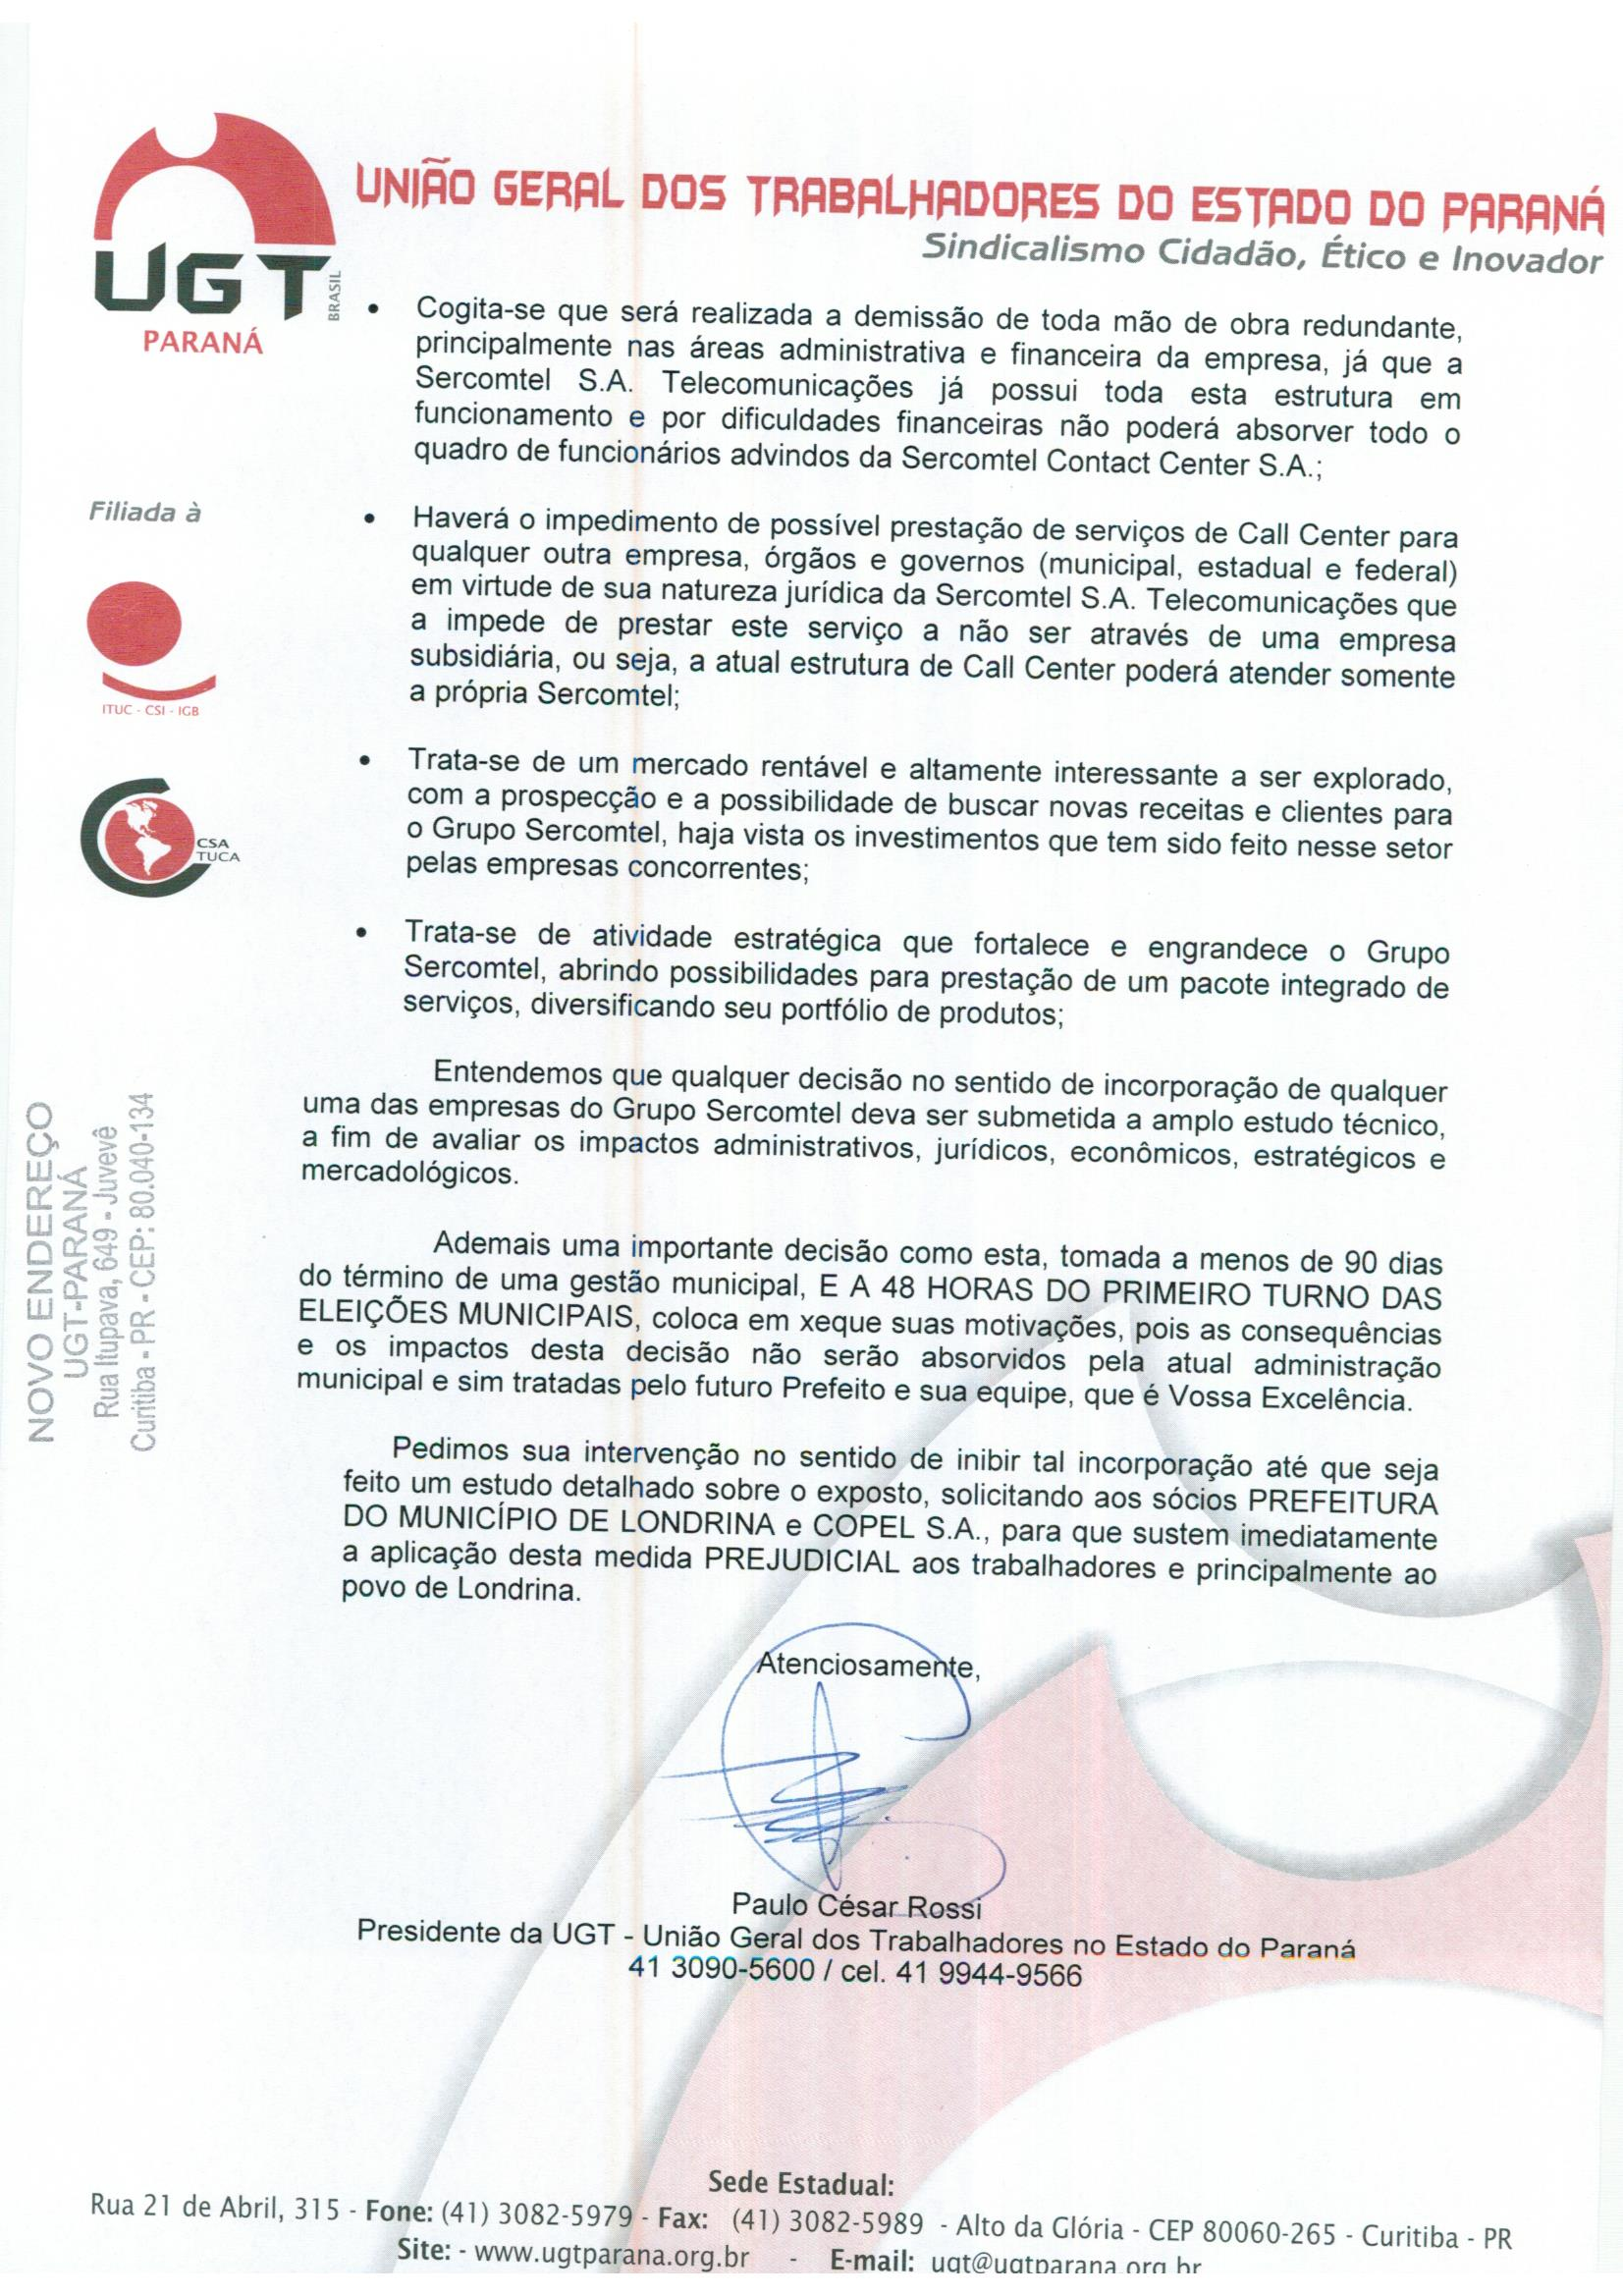 oficio-ugt-belinati-fl-2